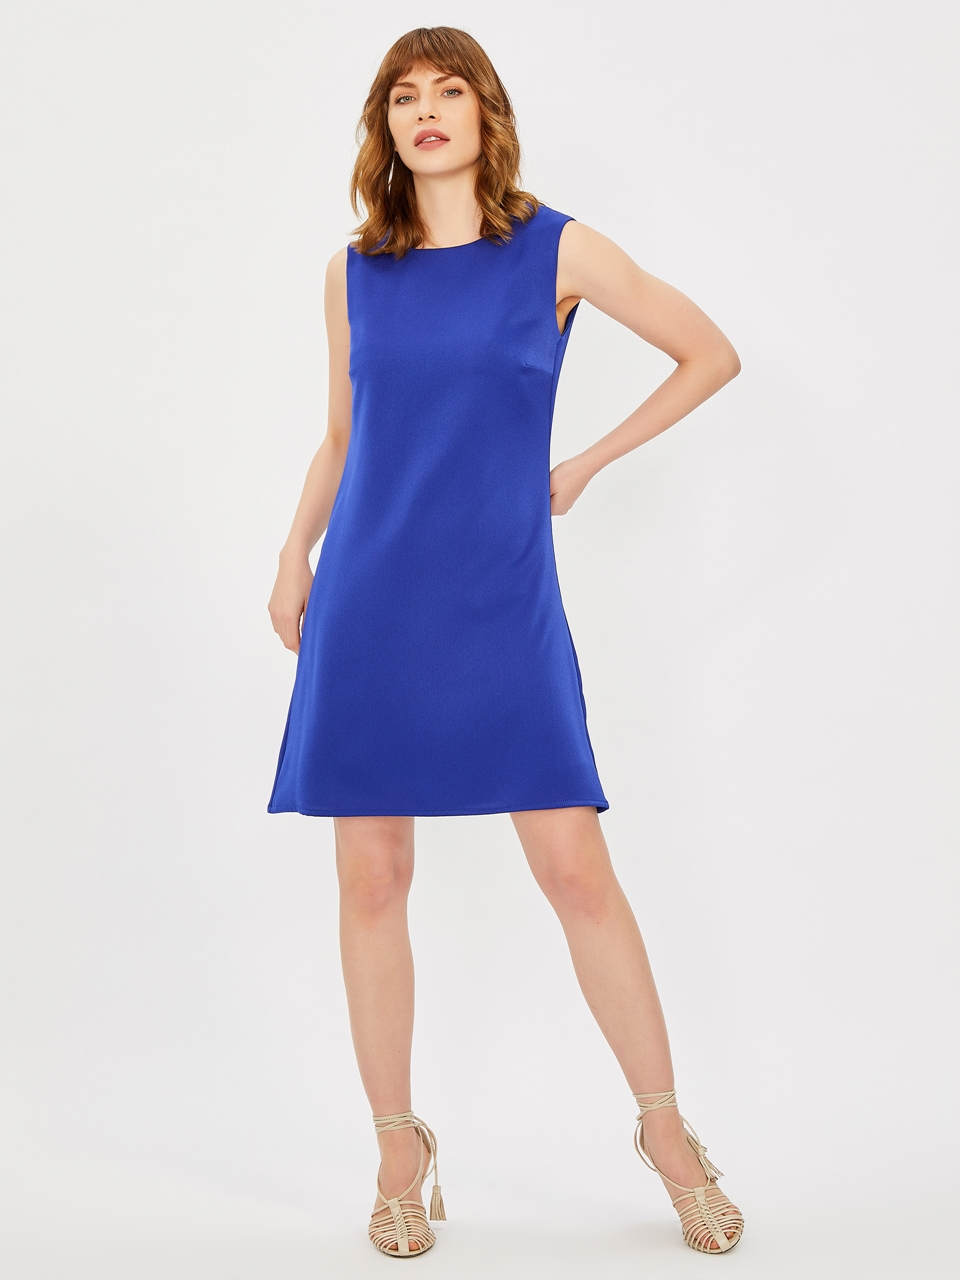 Sleeveless Classic Cut Crep Dress